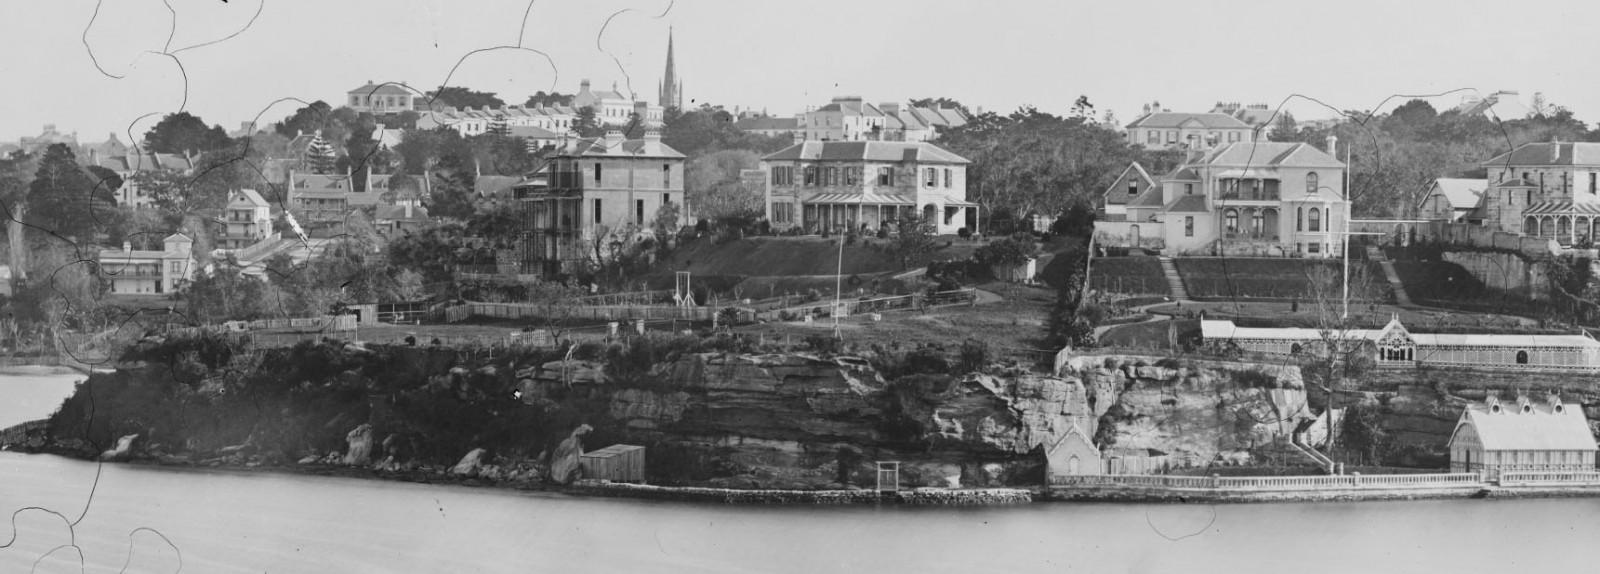 The grand Kincoppal residence (left) in 1875